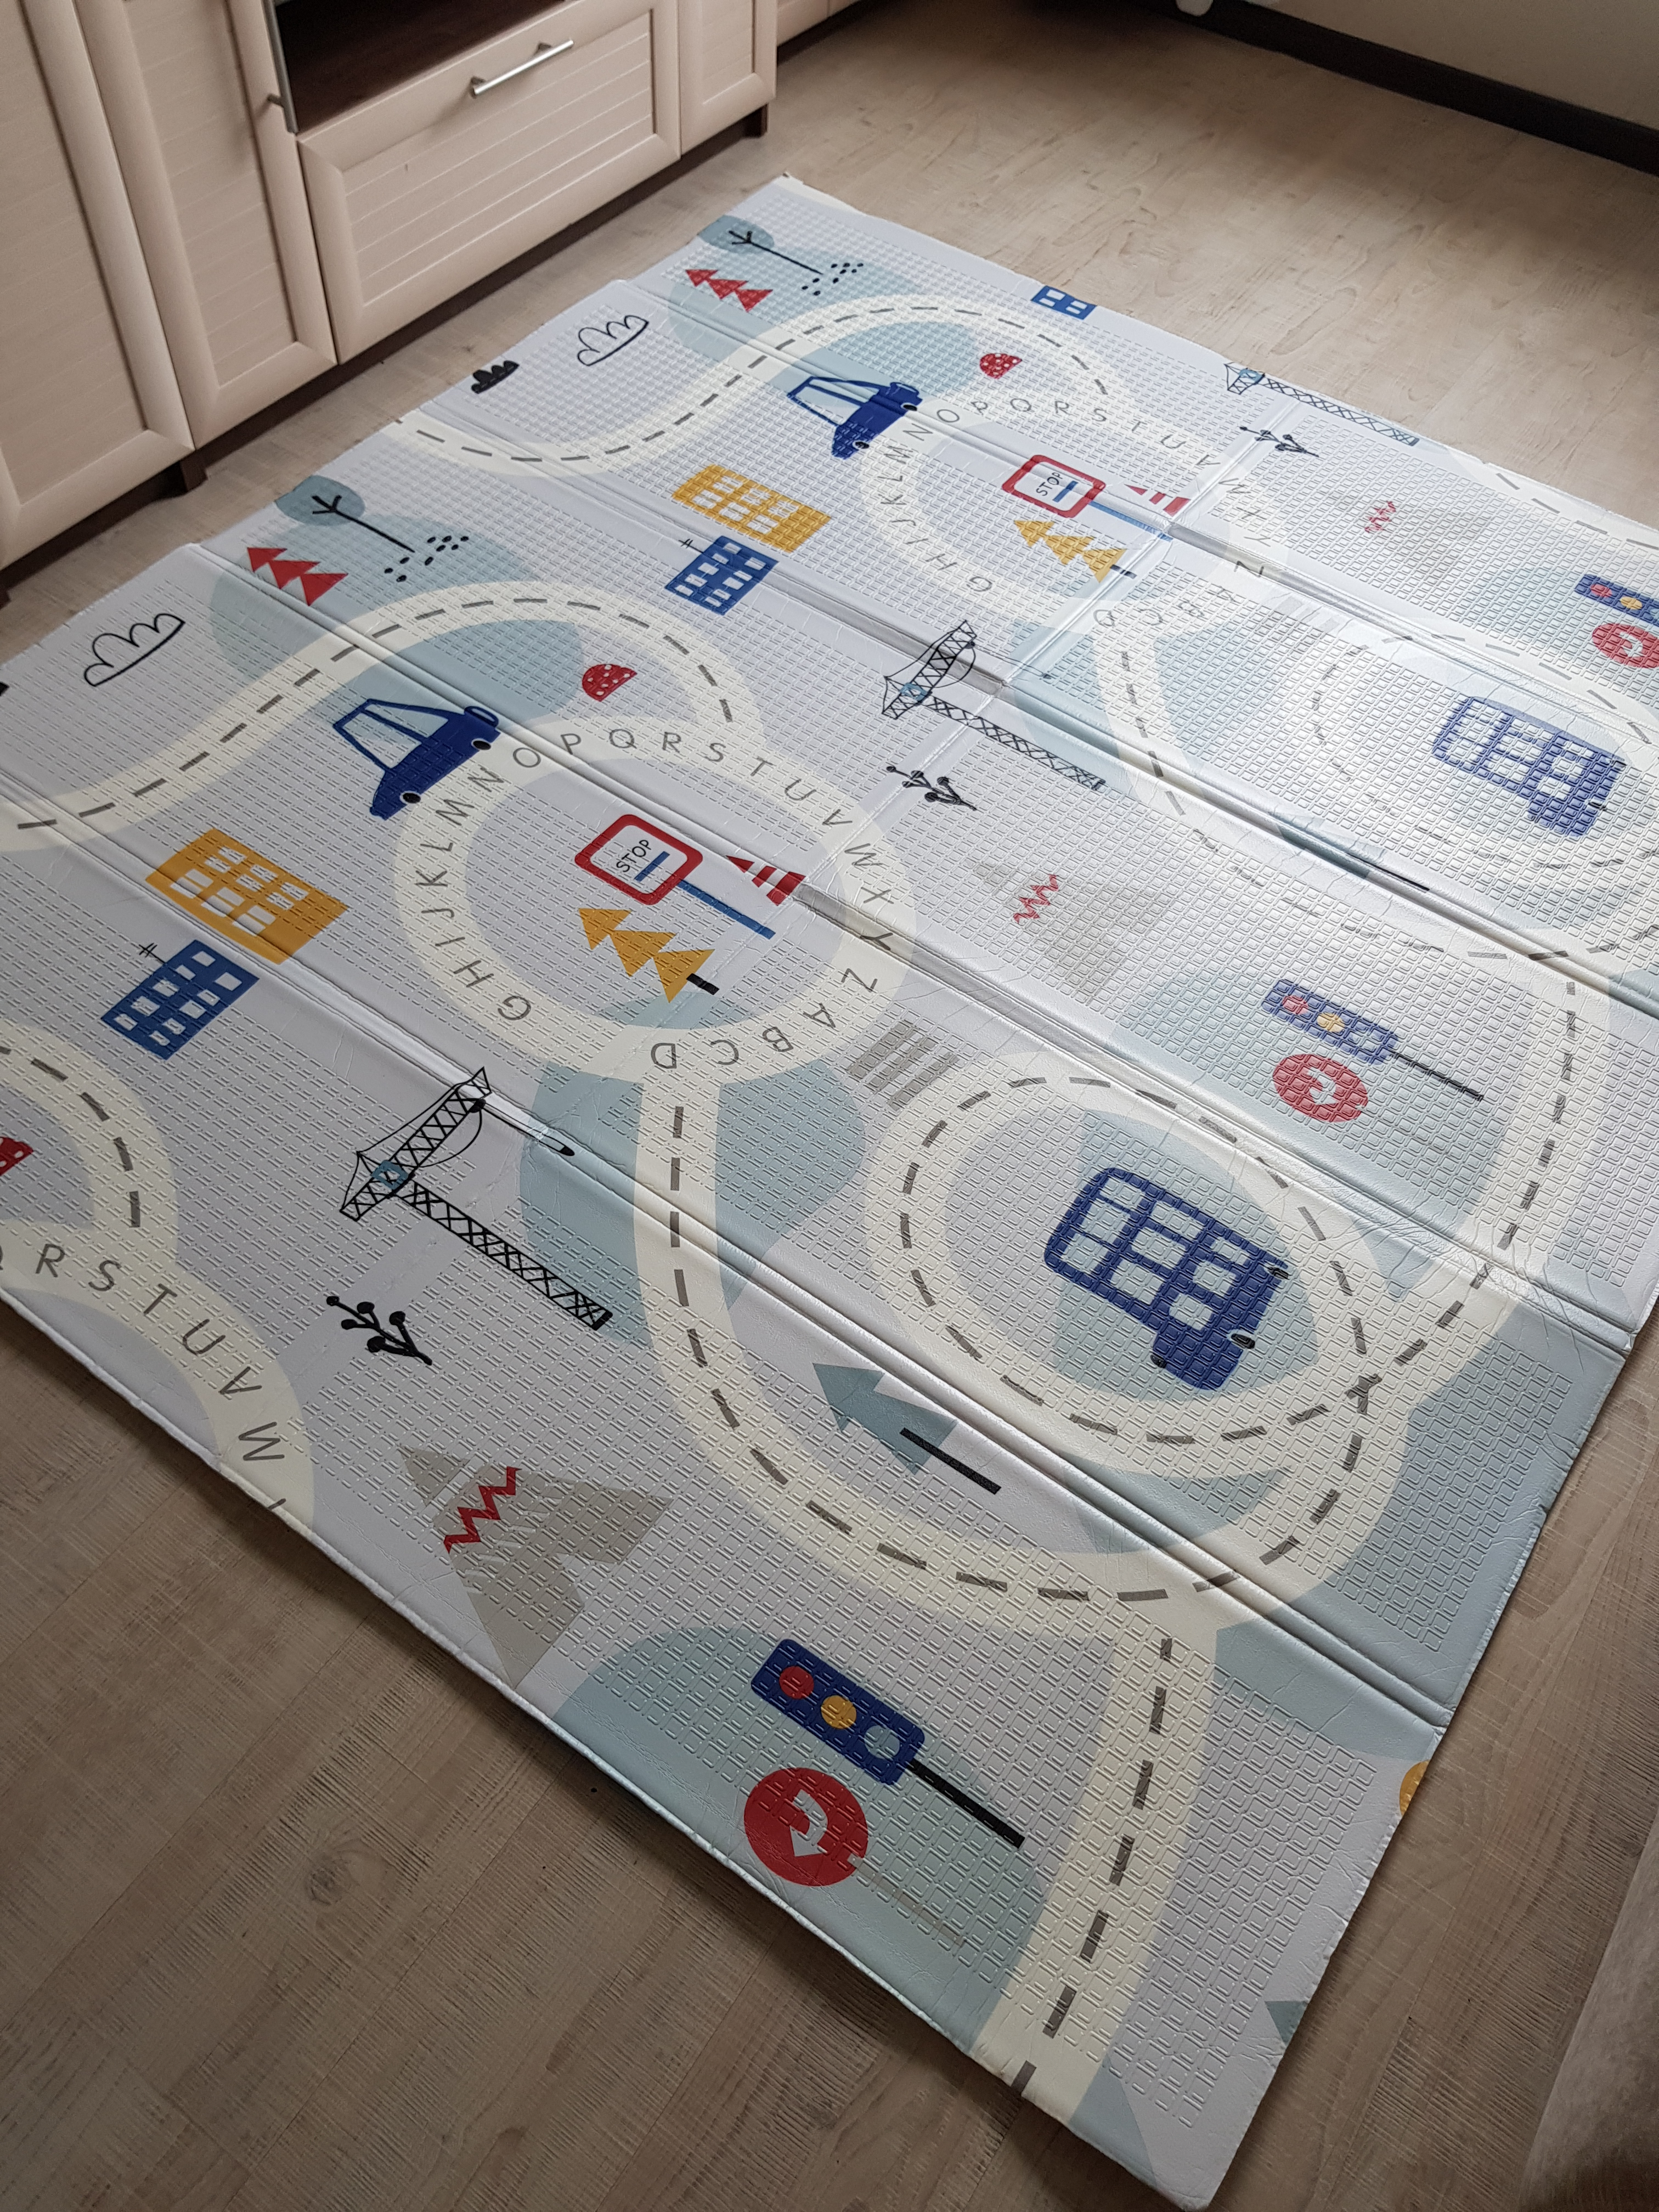 Складной коврик XPE «Транспорт и рыбки» Размер 200x180x1 см